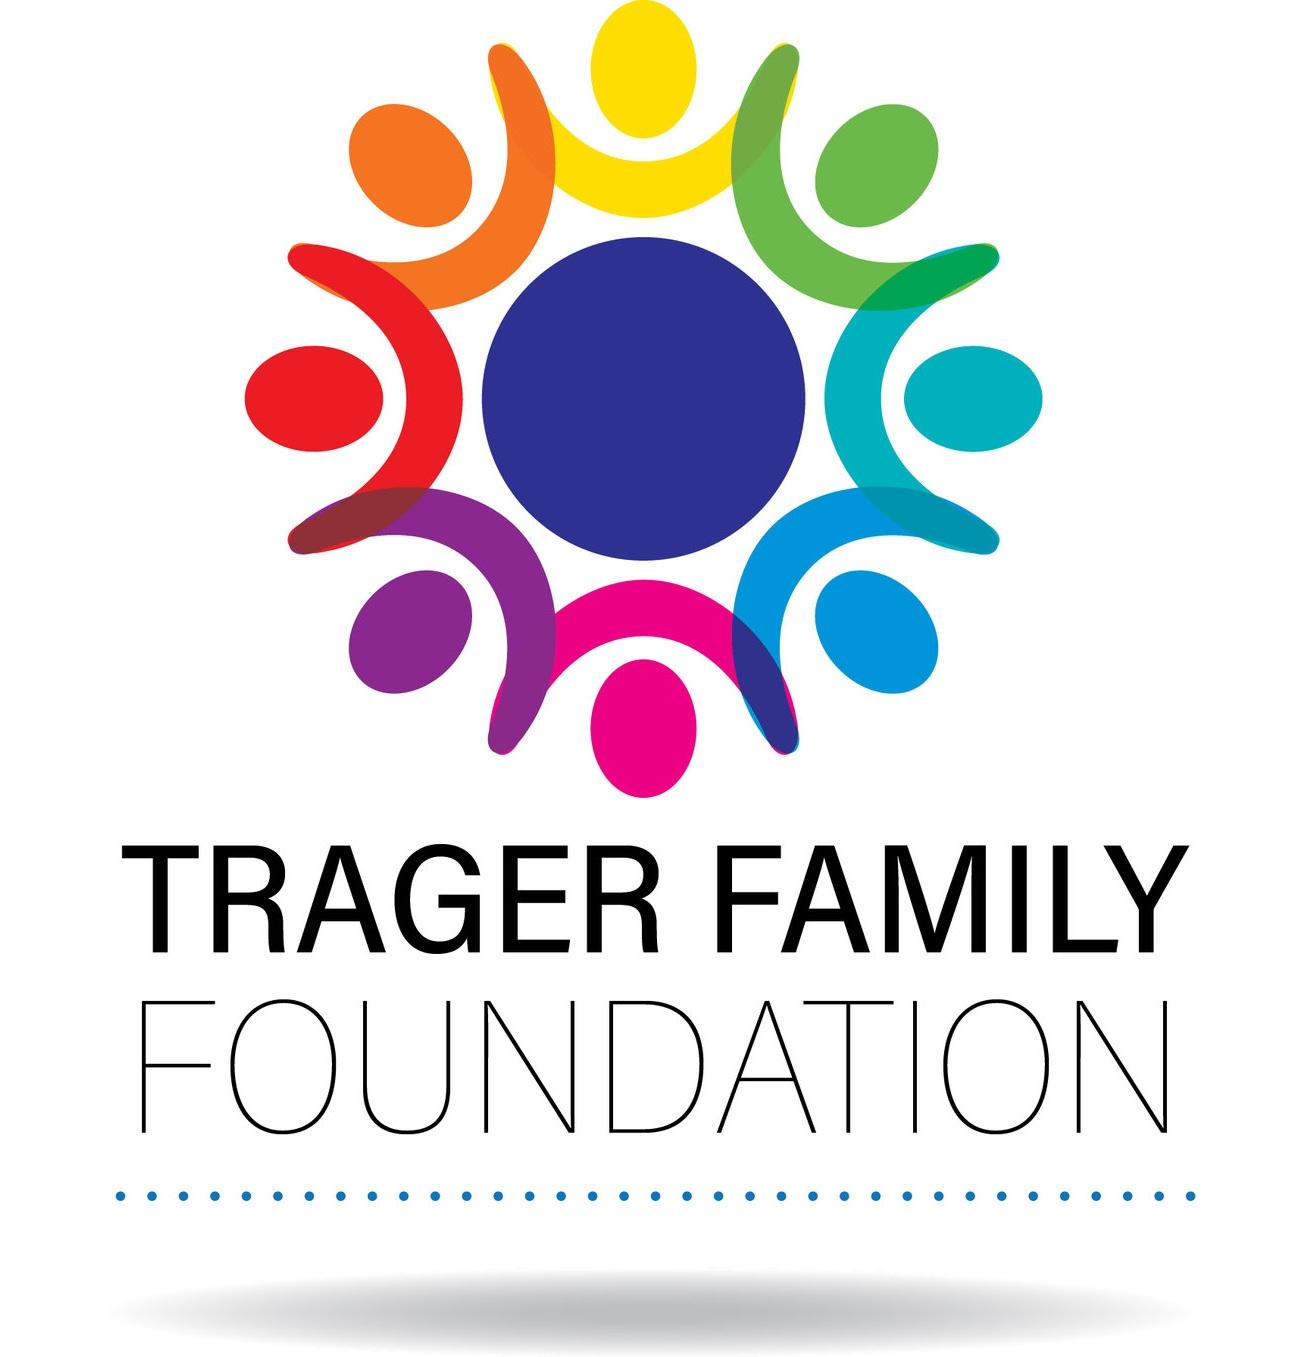 trager family foundation logo.jpg